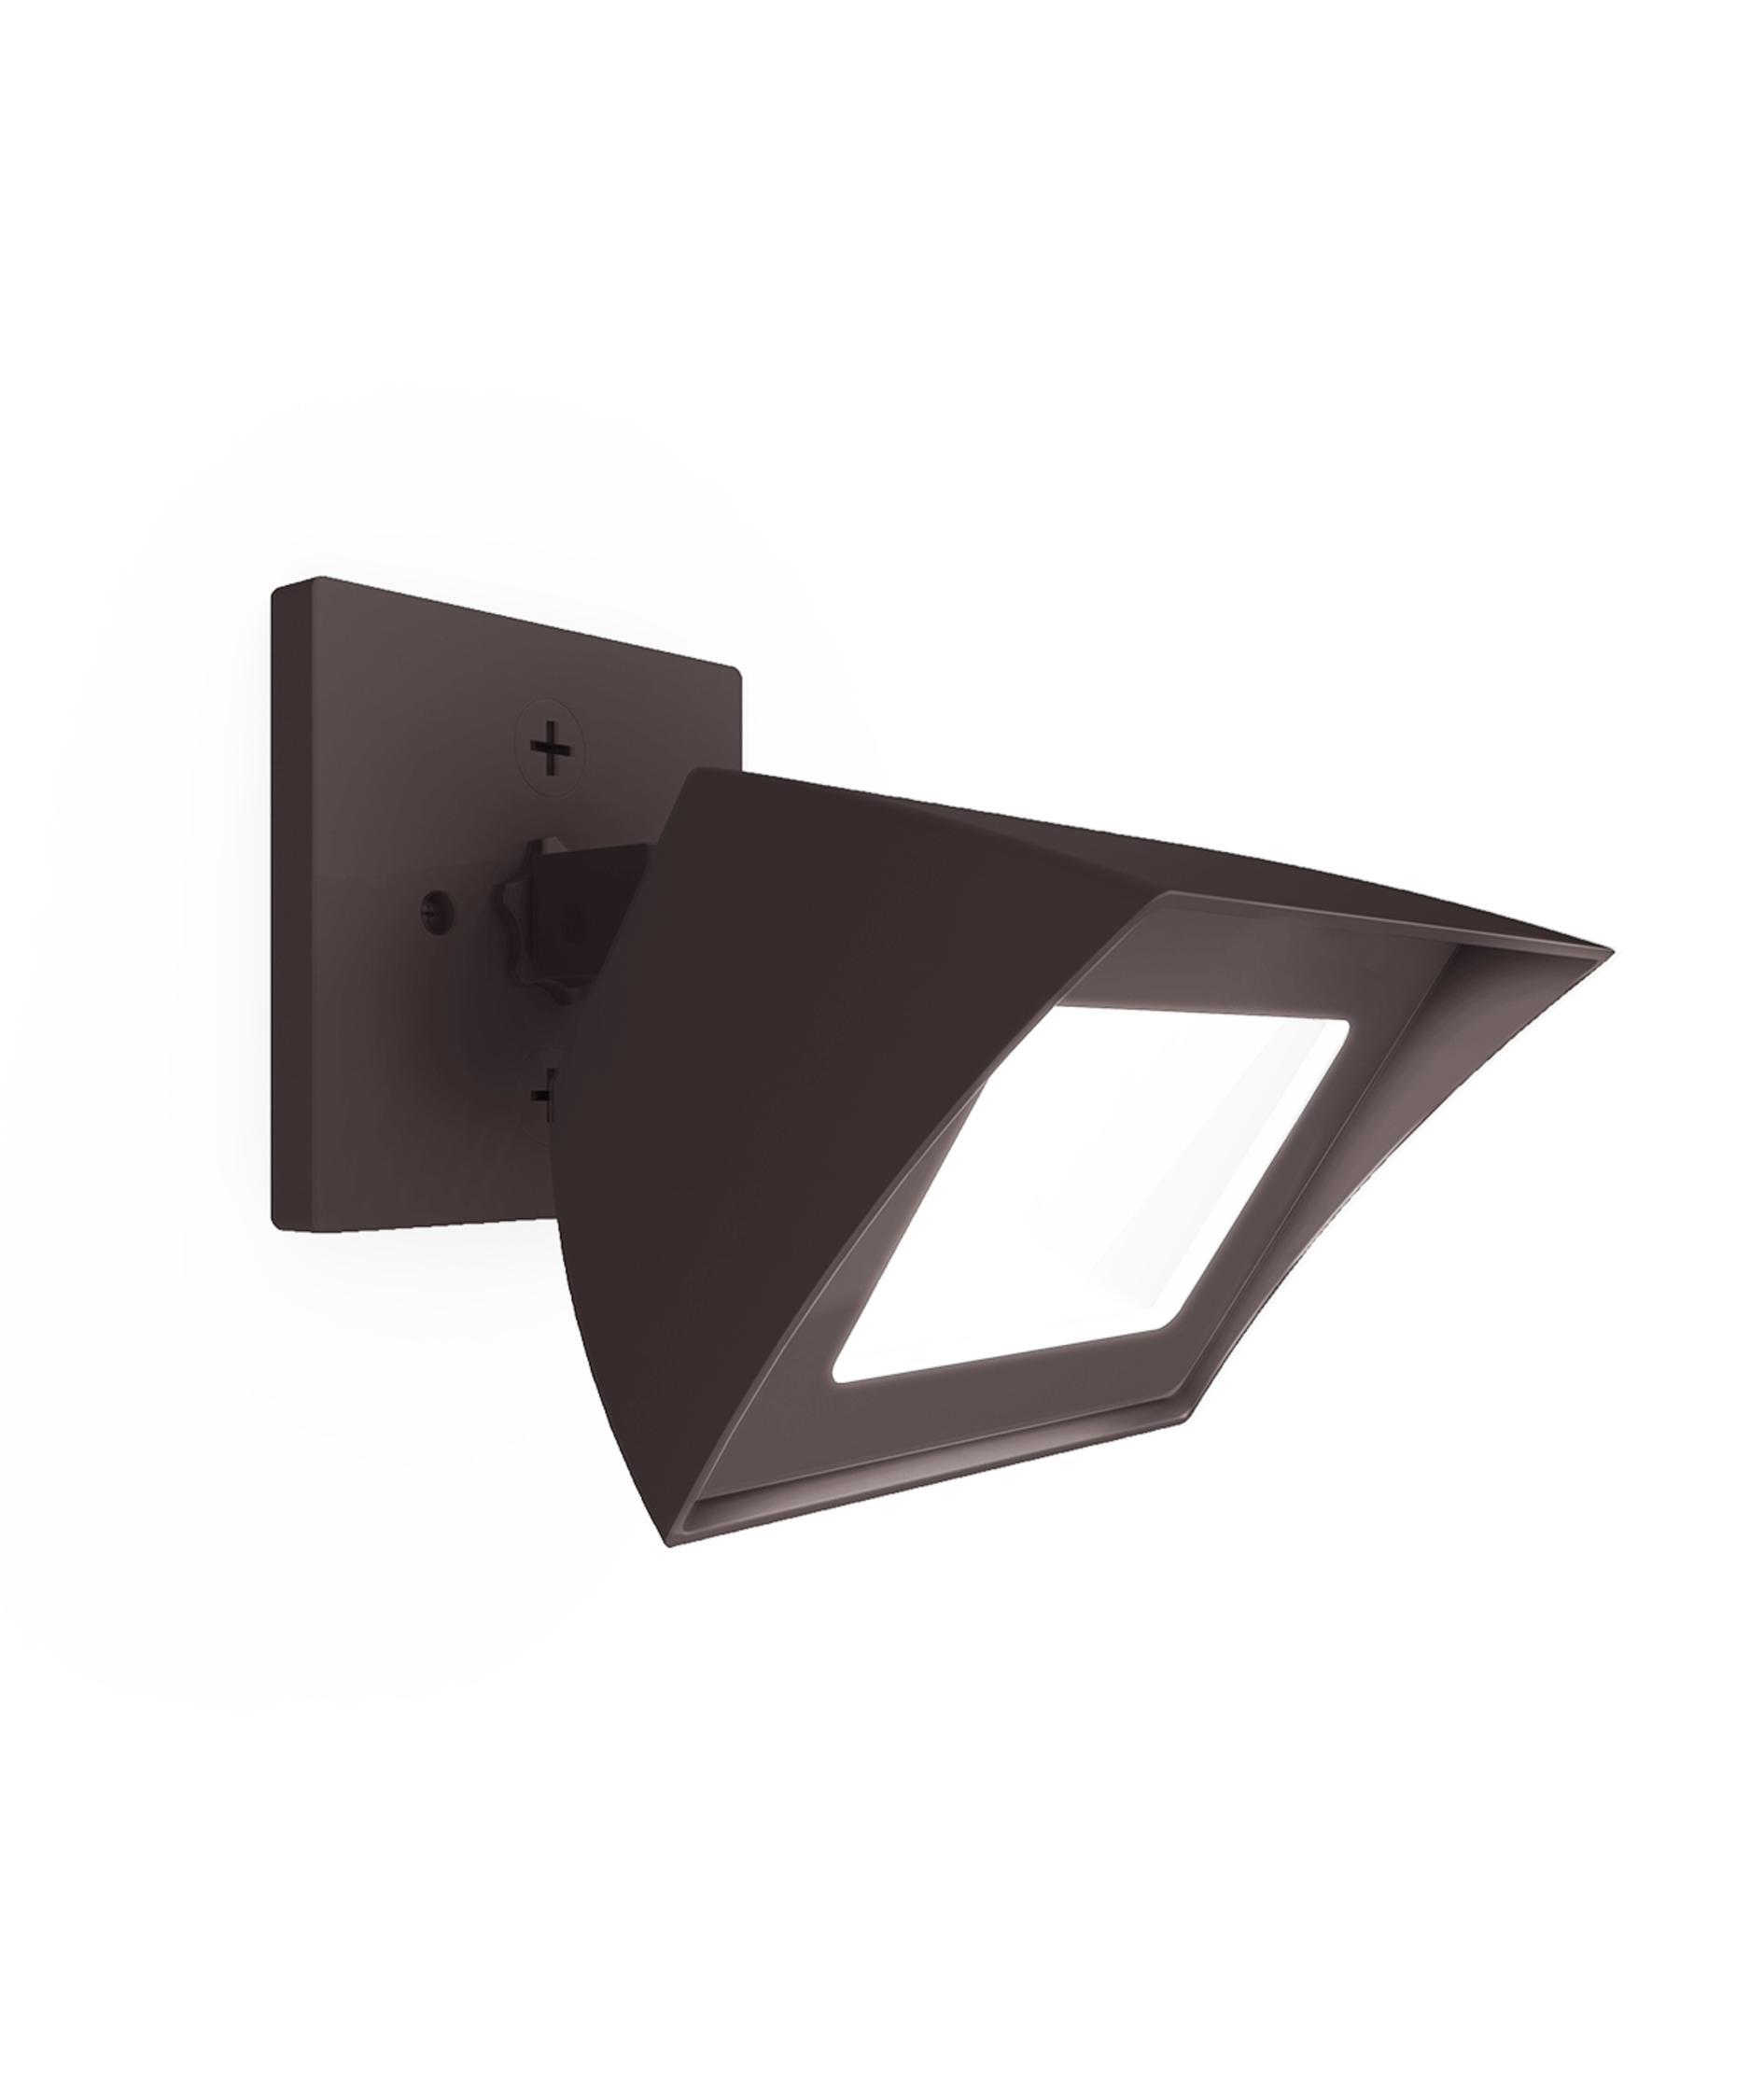 Wac lighting led - Wac Lighting Endurance 6 Inch Wide 1 Light Outdoor Wall Light Capitol Lighting 1 800lighting Com